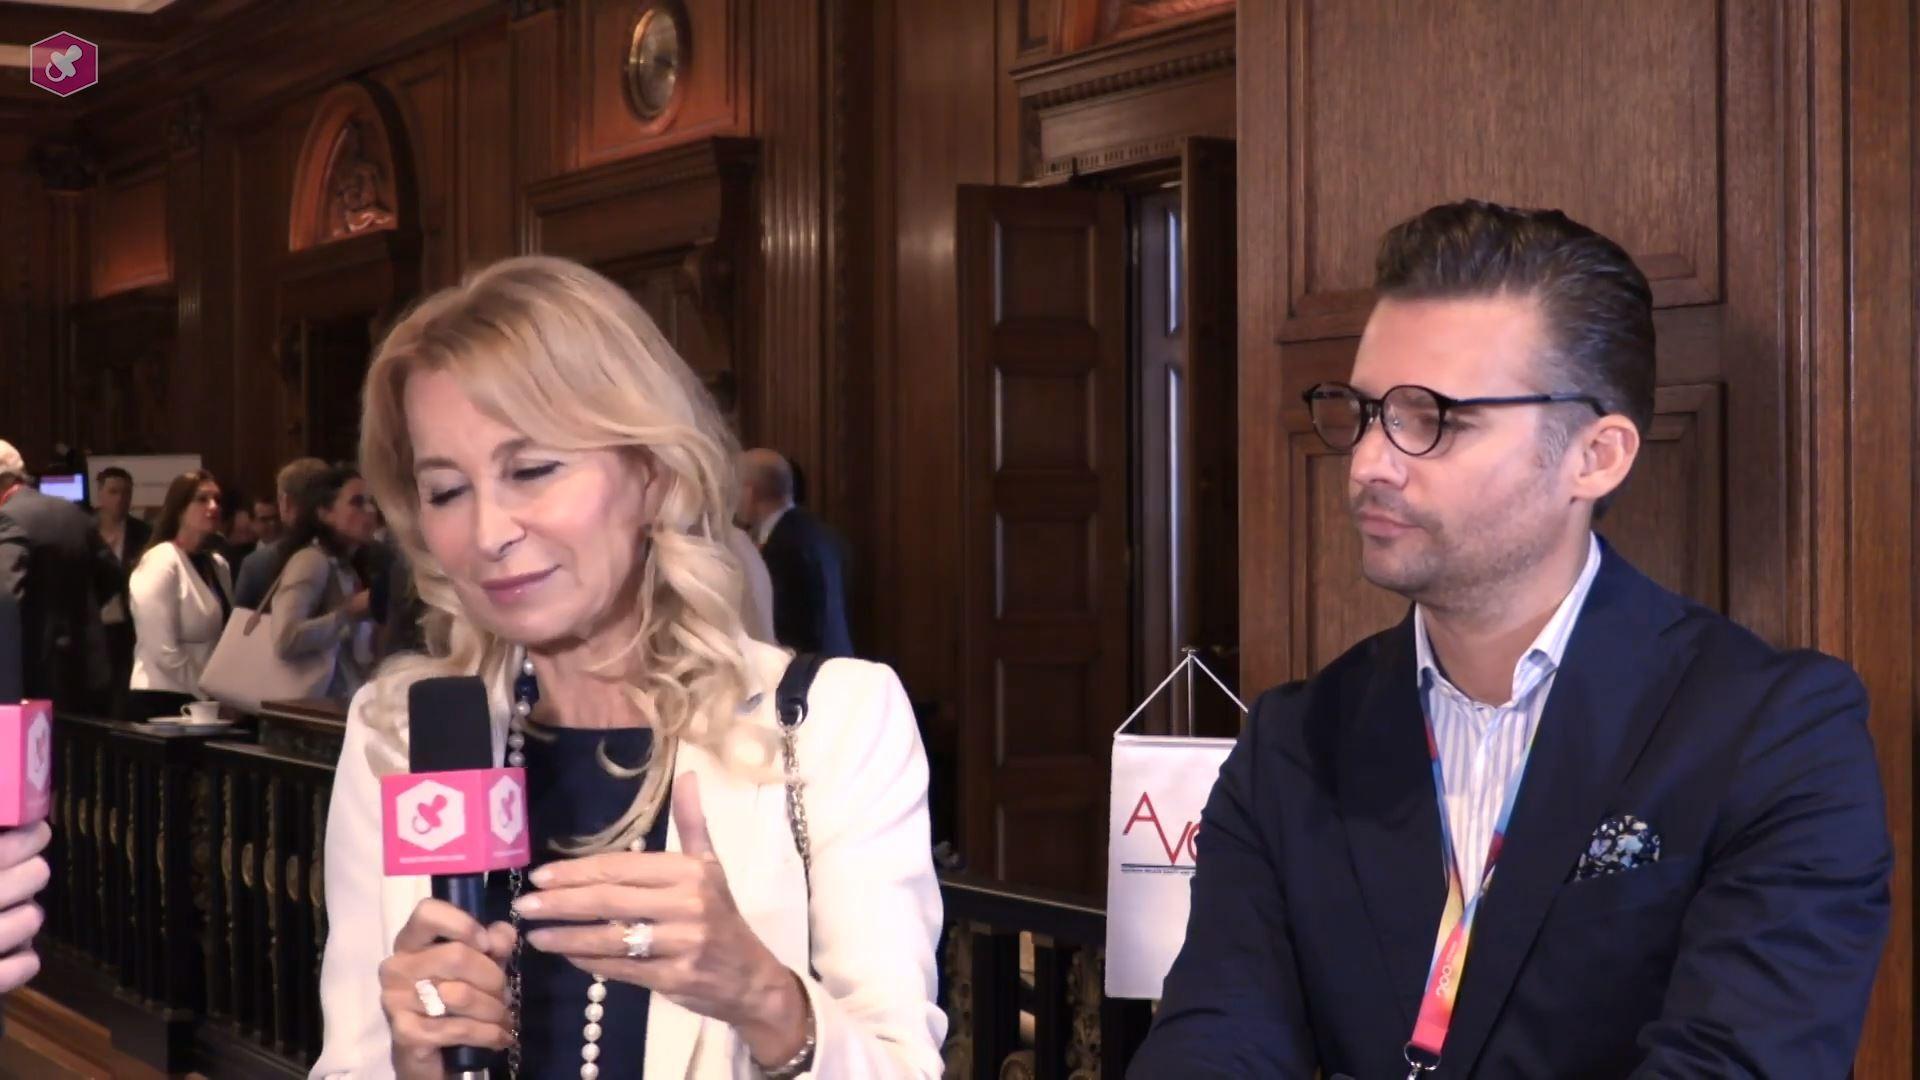 Brutkasten-Talk with Antonella Mei Pochtler and Thomas Lanyi